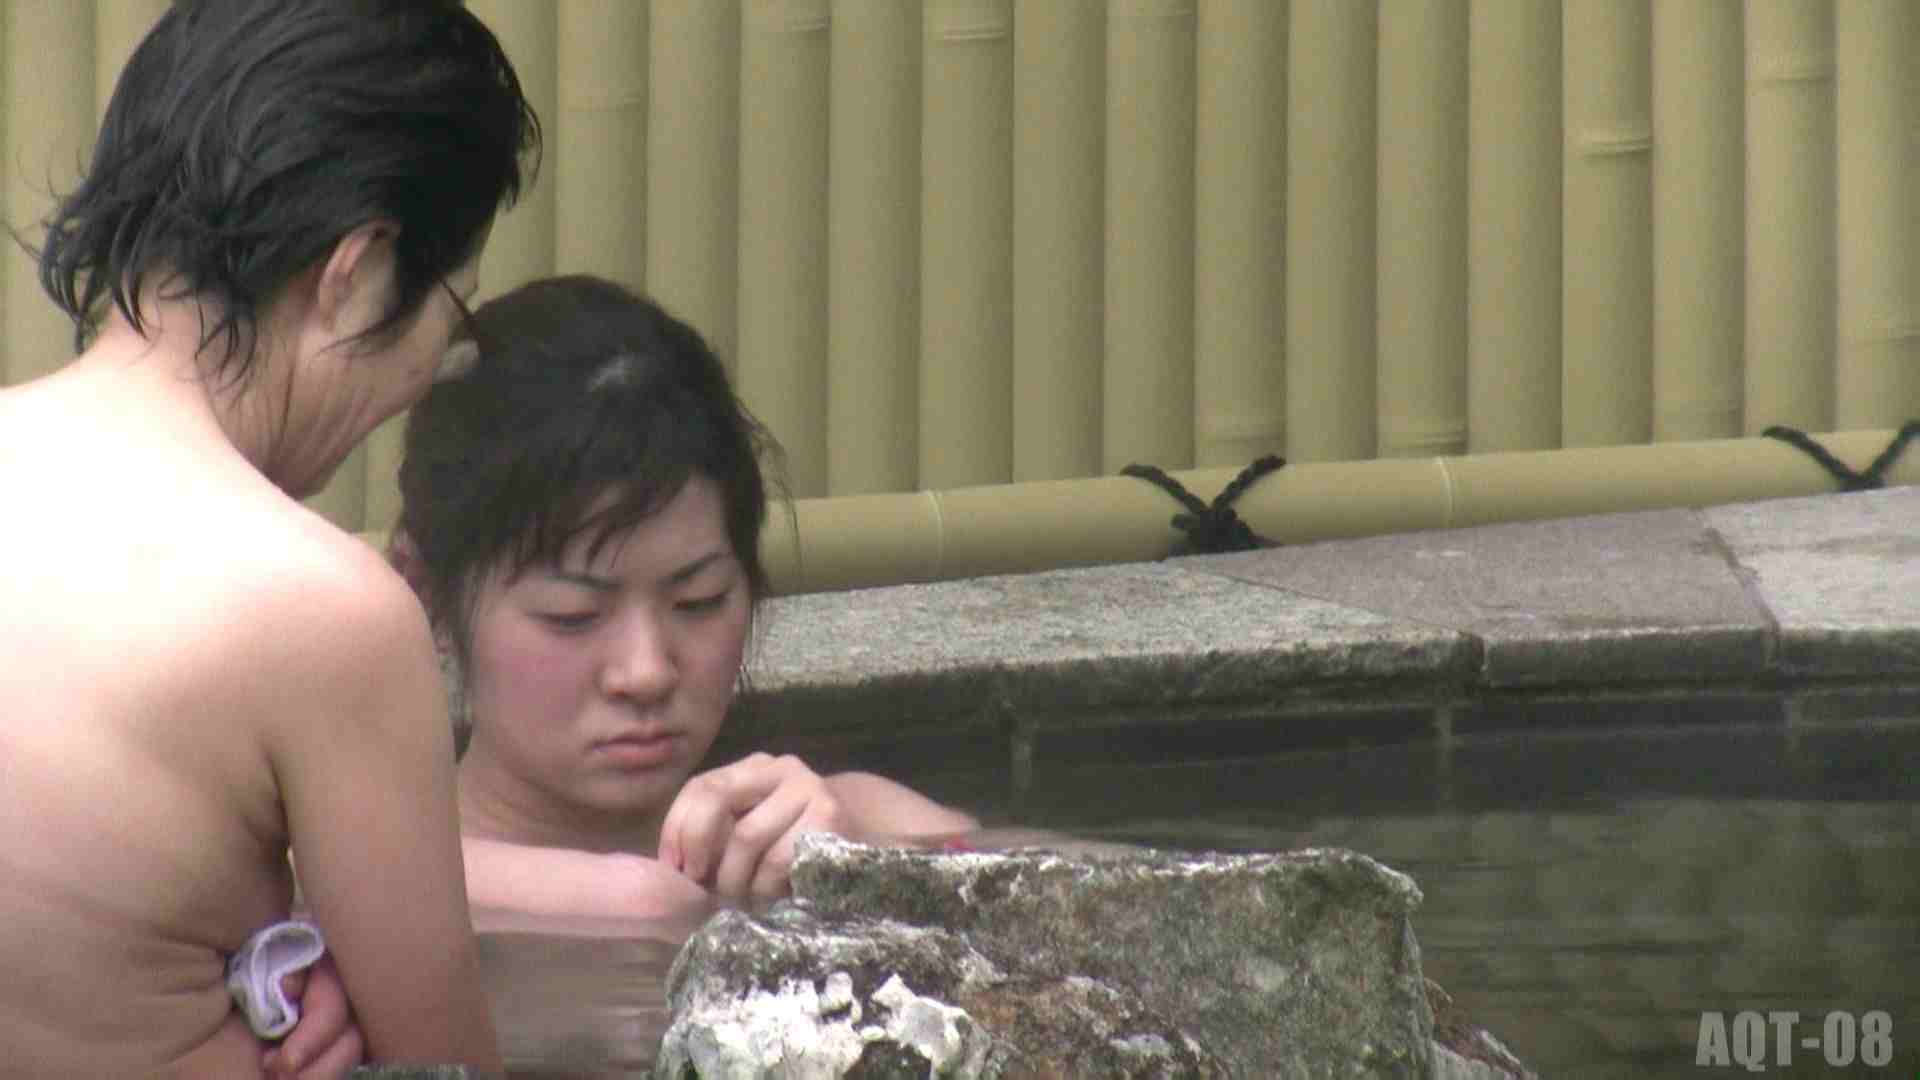 Aquaな露天風呂Vol.774 露天風呂突入 おまんこ動画流出 78pic 32